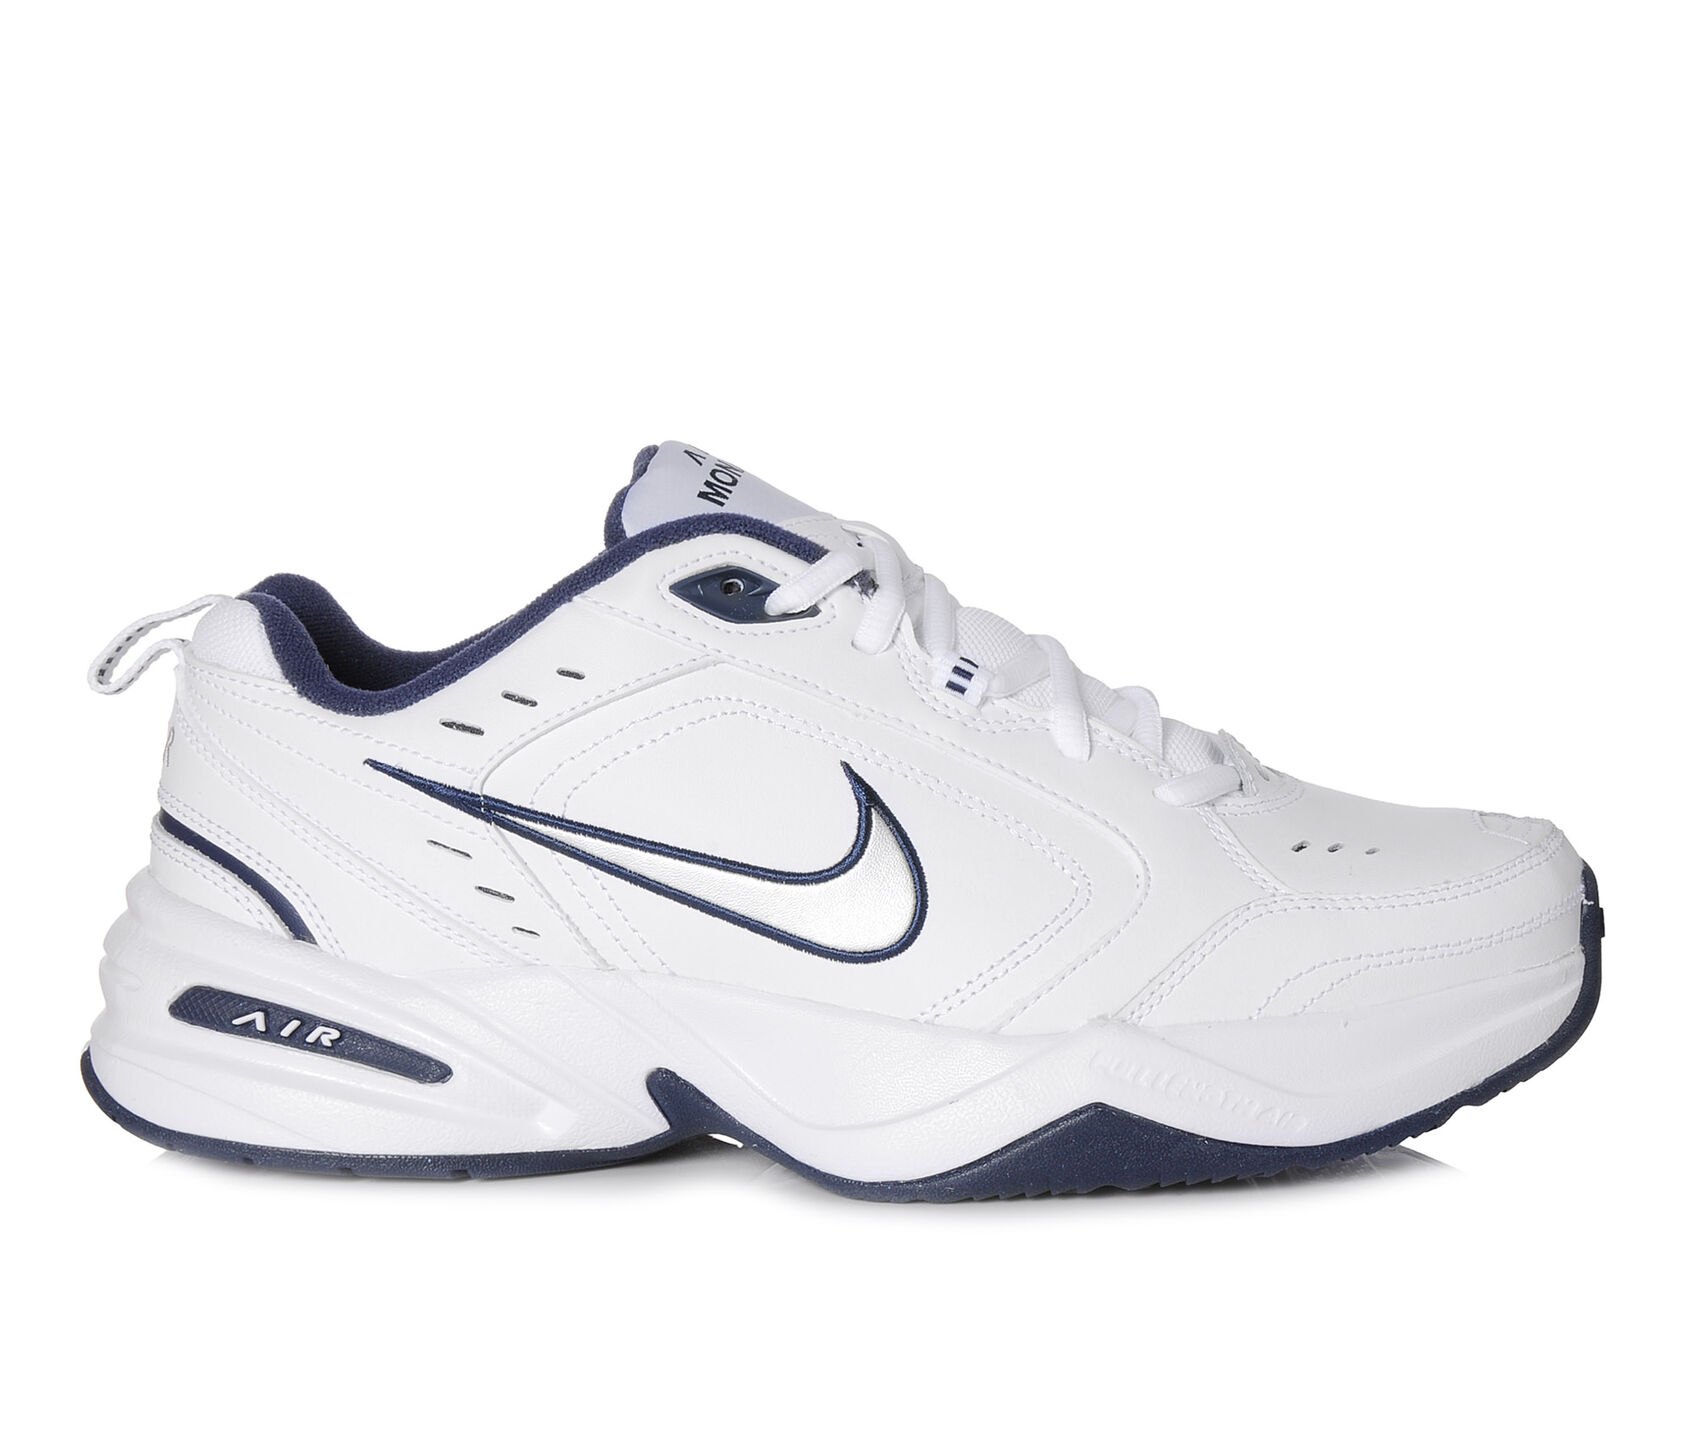 Nike Slide On Tennis Shoes